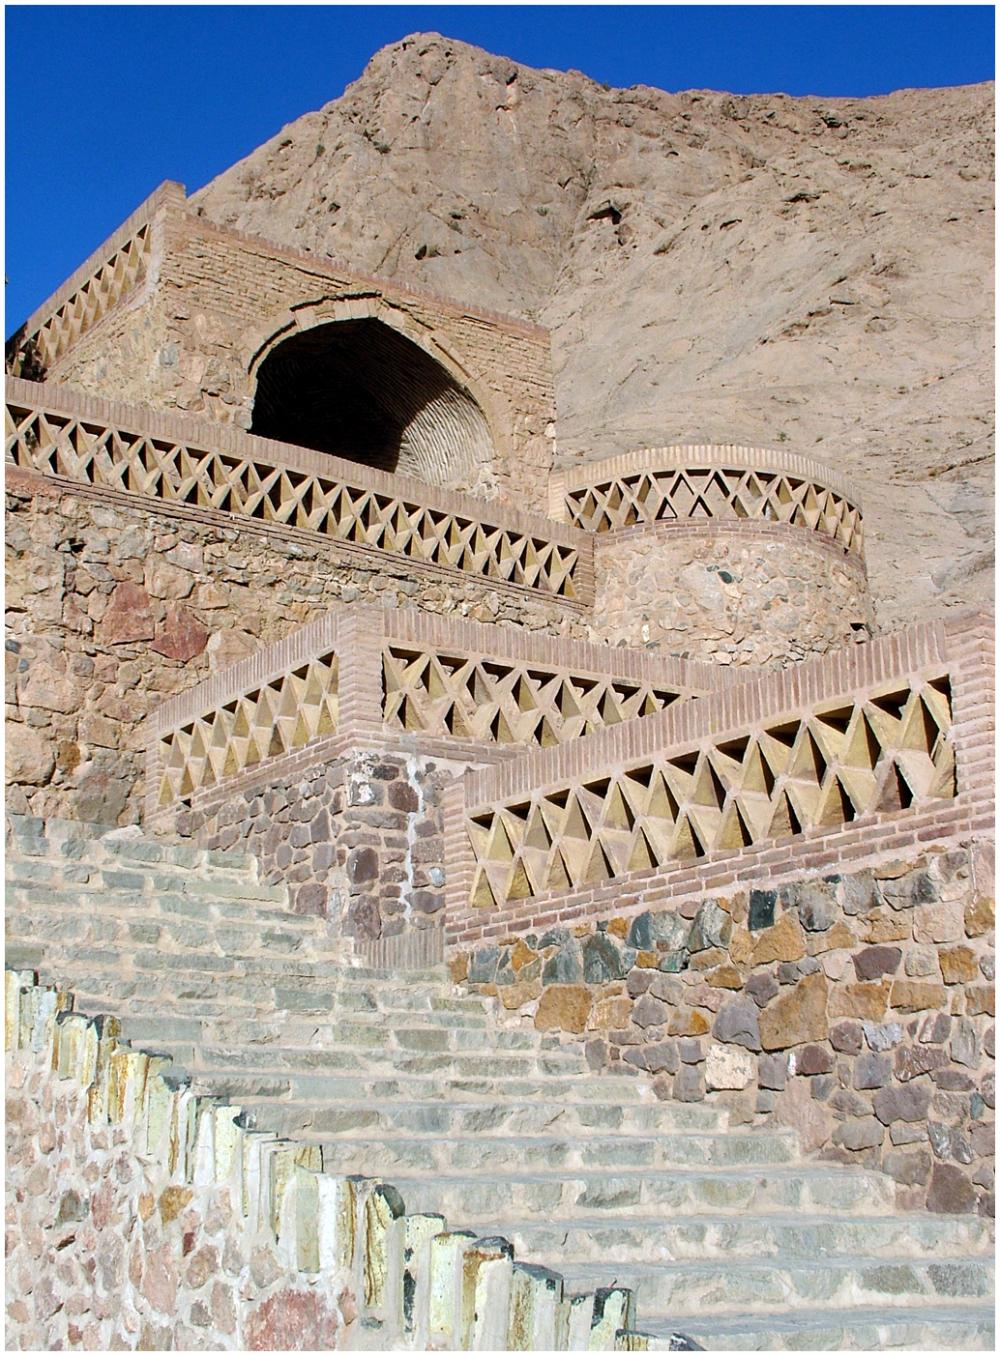 Bozorgmehr tomb 2